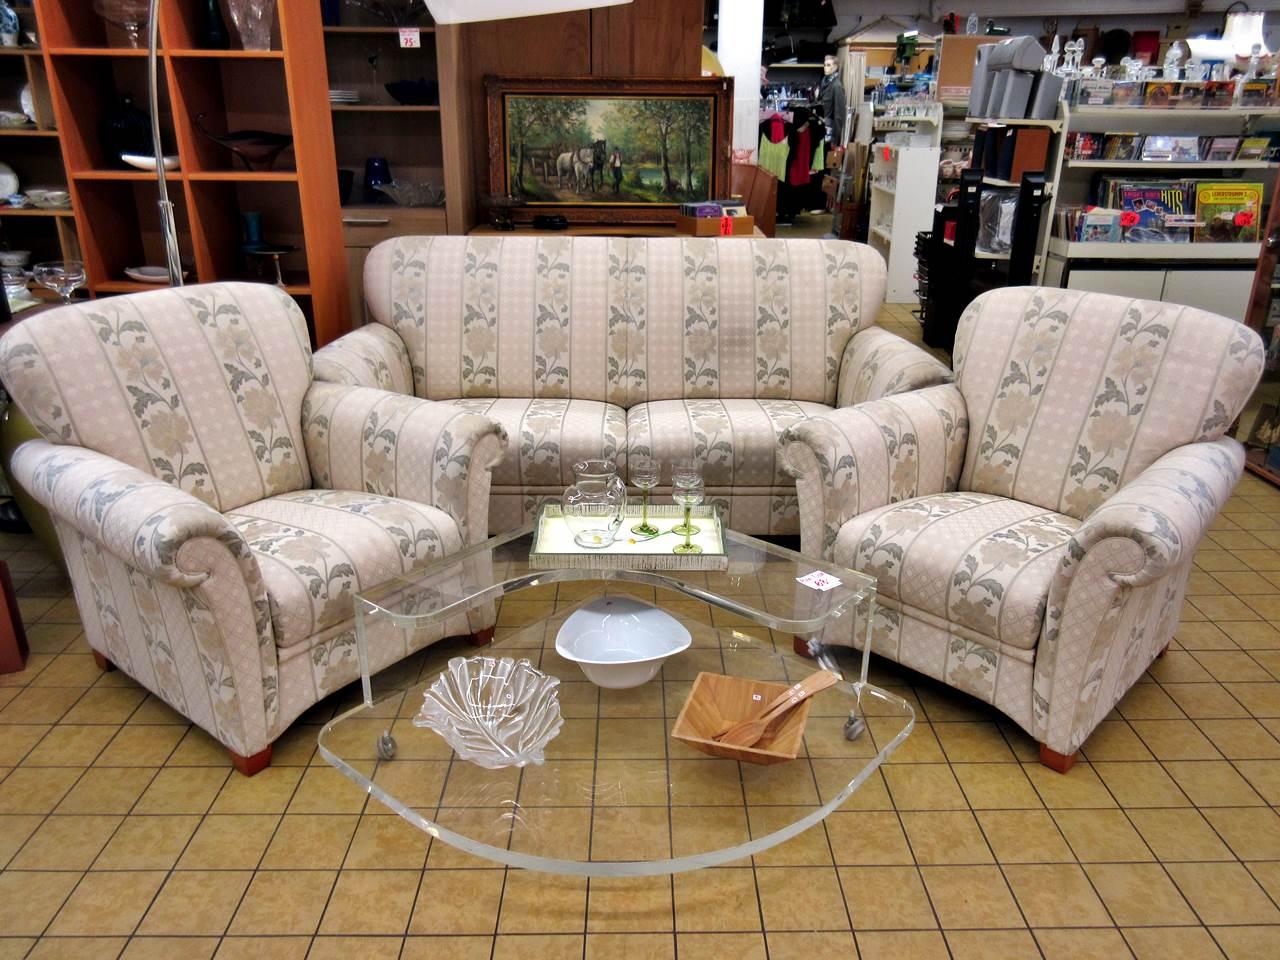 Full Size of Sofa Antik Chesterfield Leder Couch Murah Malaysia Big Gebraucht Stil Antiklederoptik Bali Kaufen Couchgarnitur Konfigurator In L Form Federkern Günstig Rund Sofa Sofa Antik